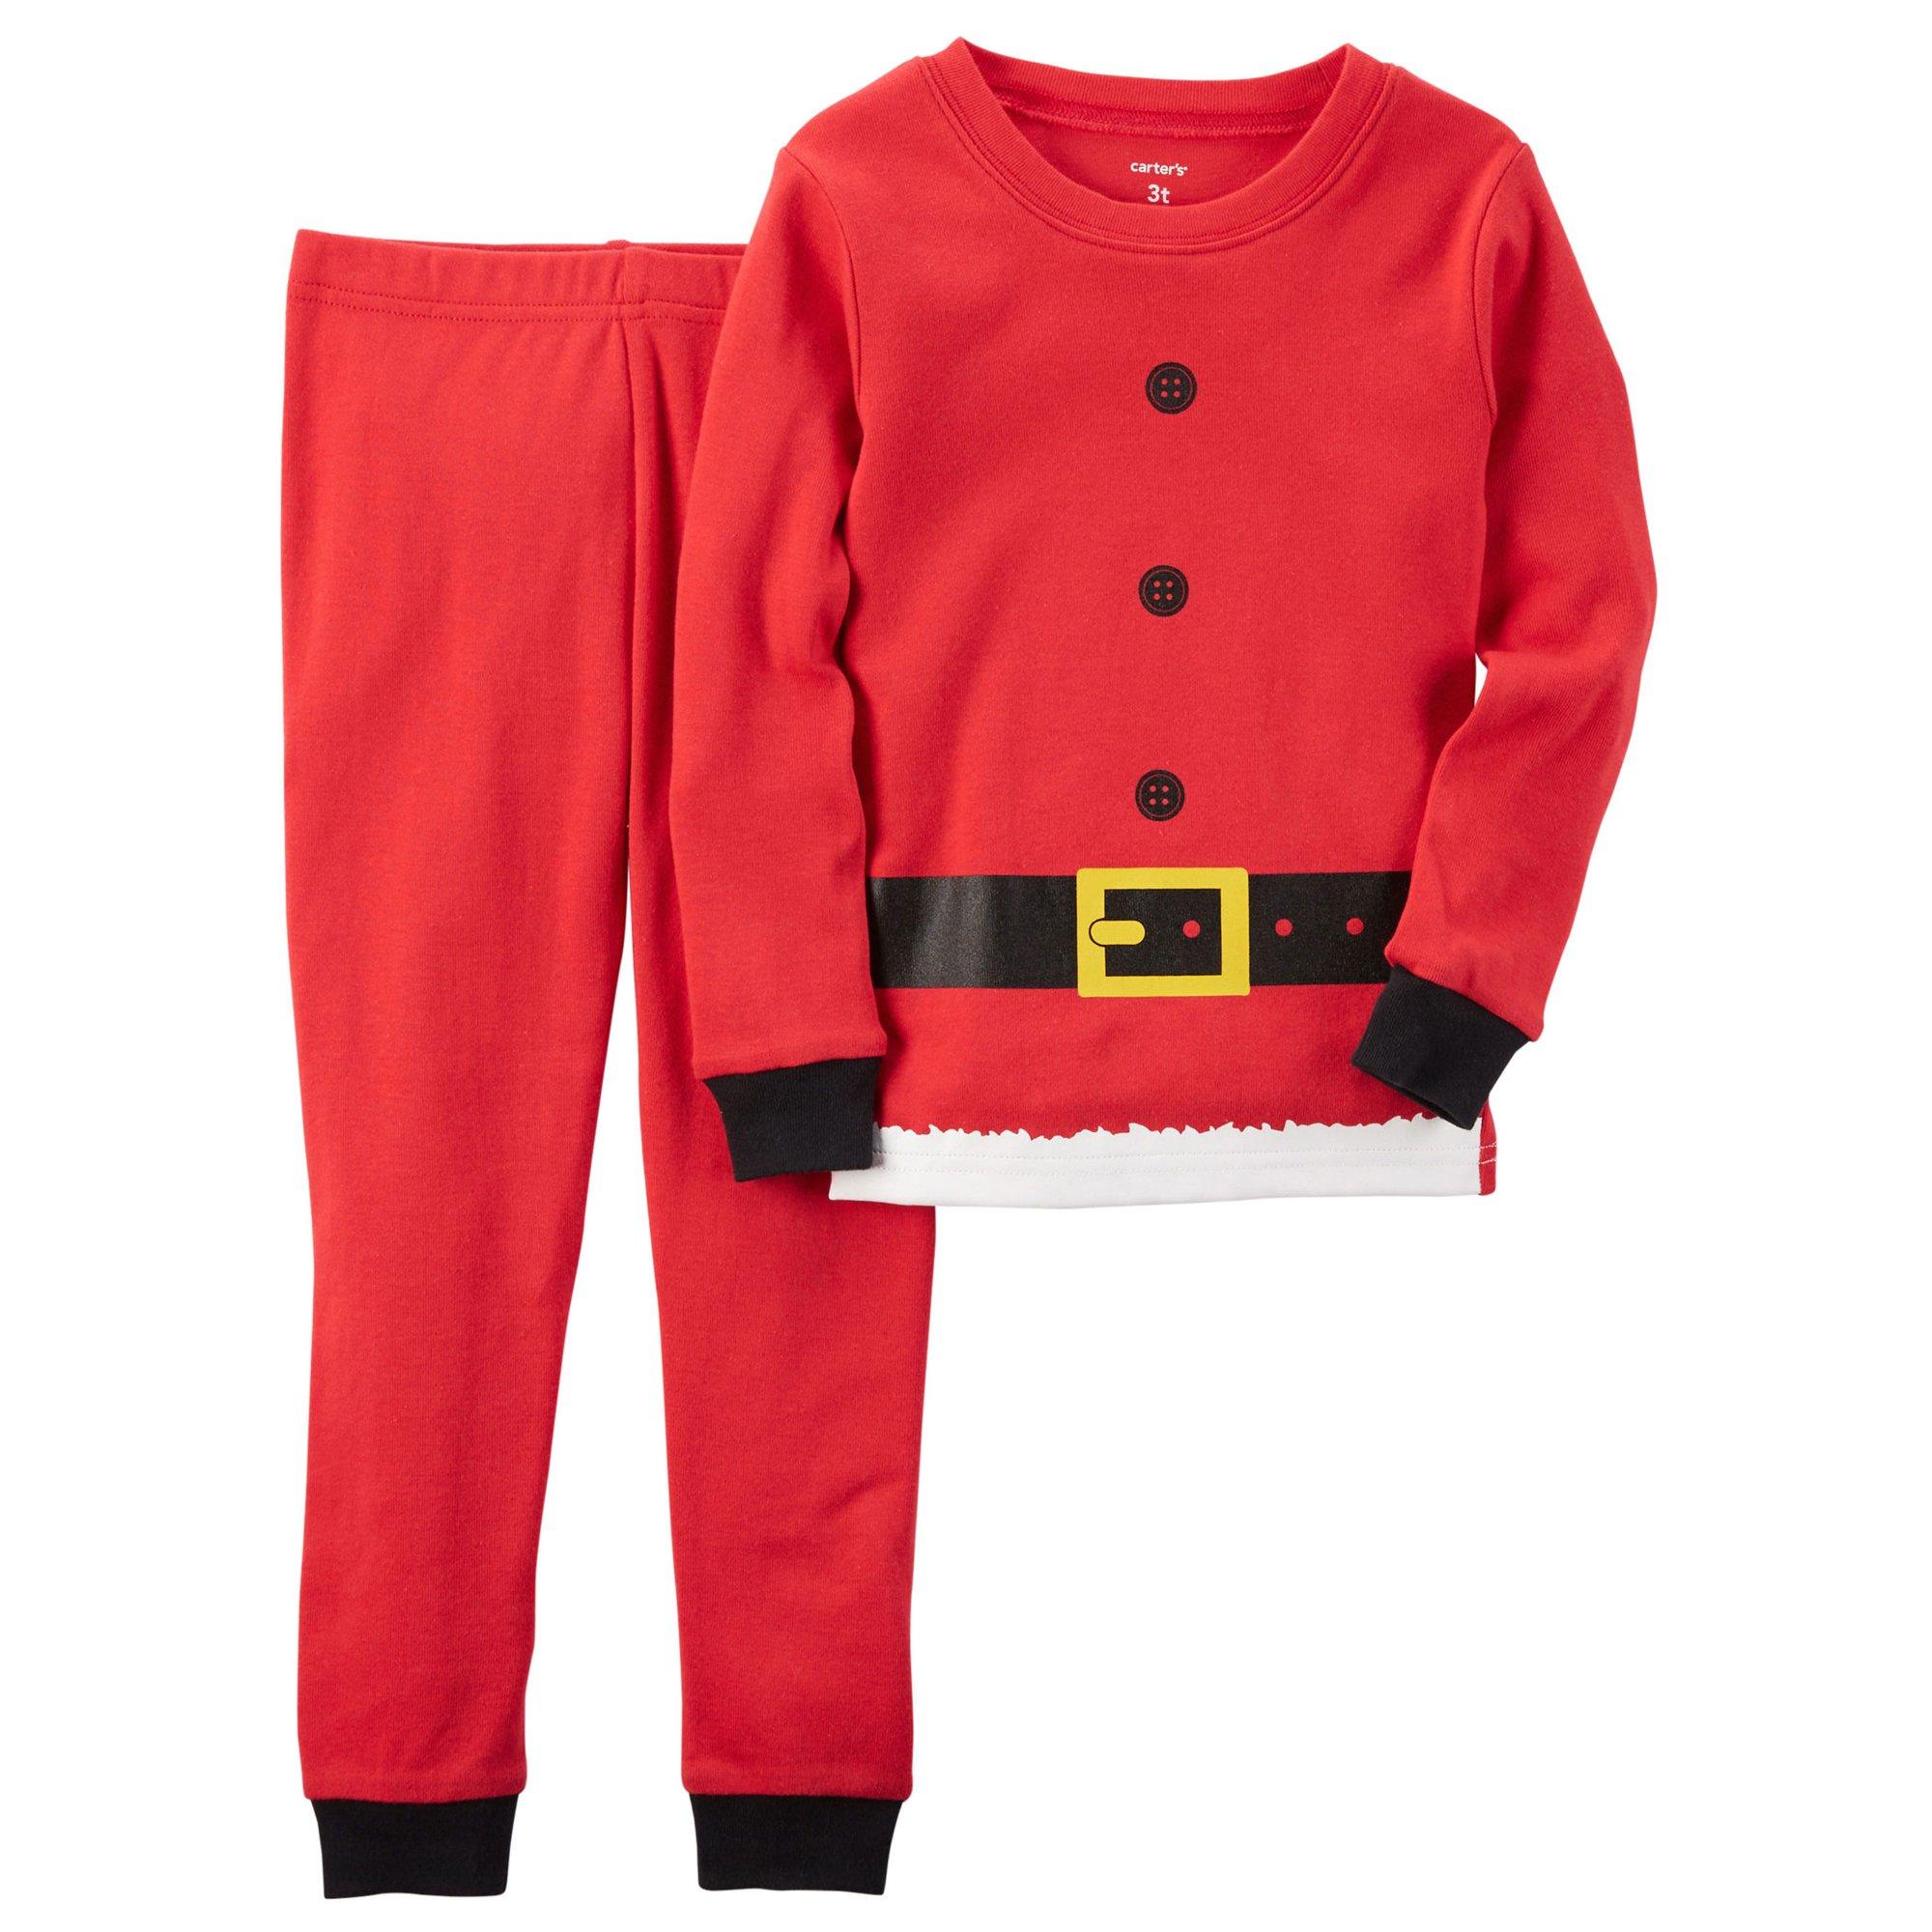 Carter's Boys' 2T-4T 2 Piece Santa Suit Pajama Set 3T